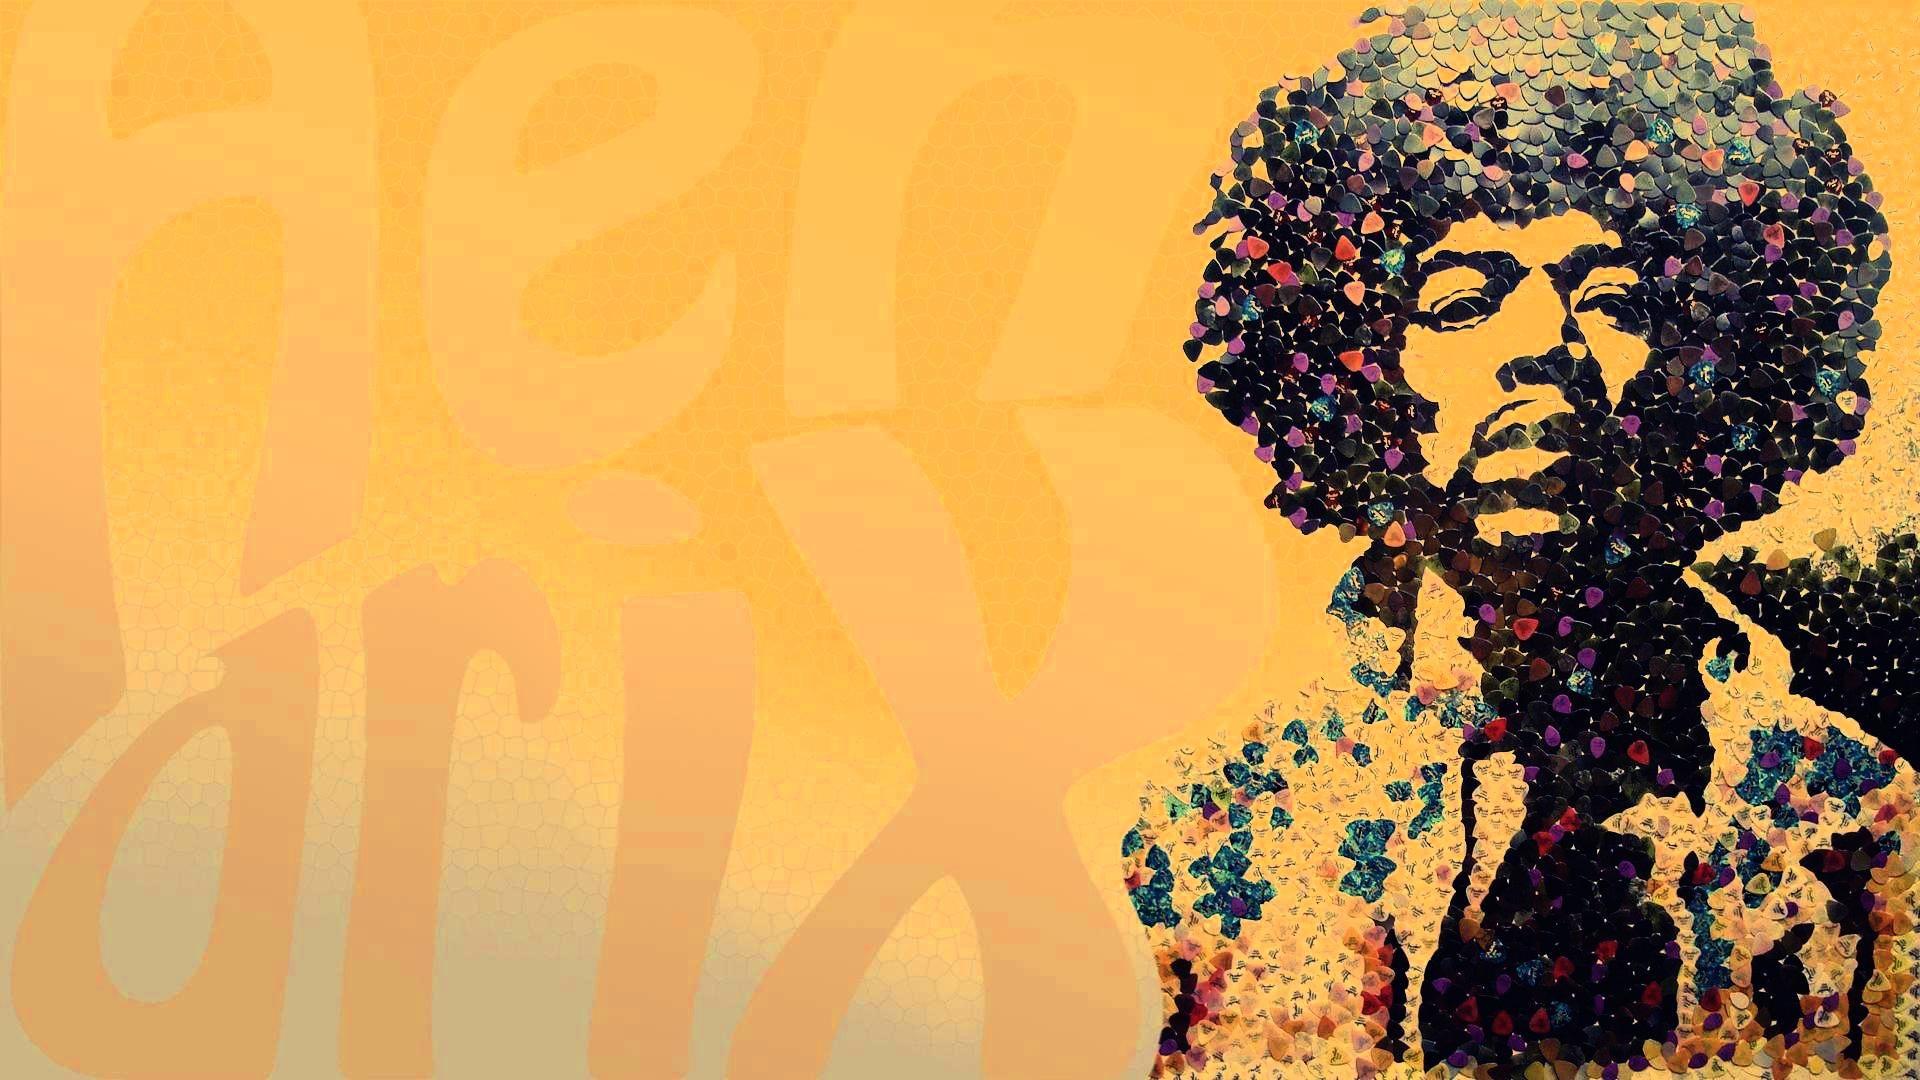 Pin Jimi Hendrix Wallpaper on Pinterest Jimi Hendrix